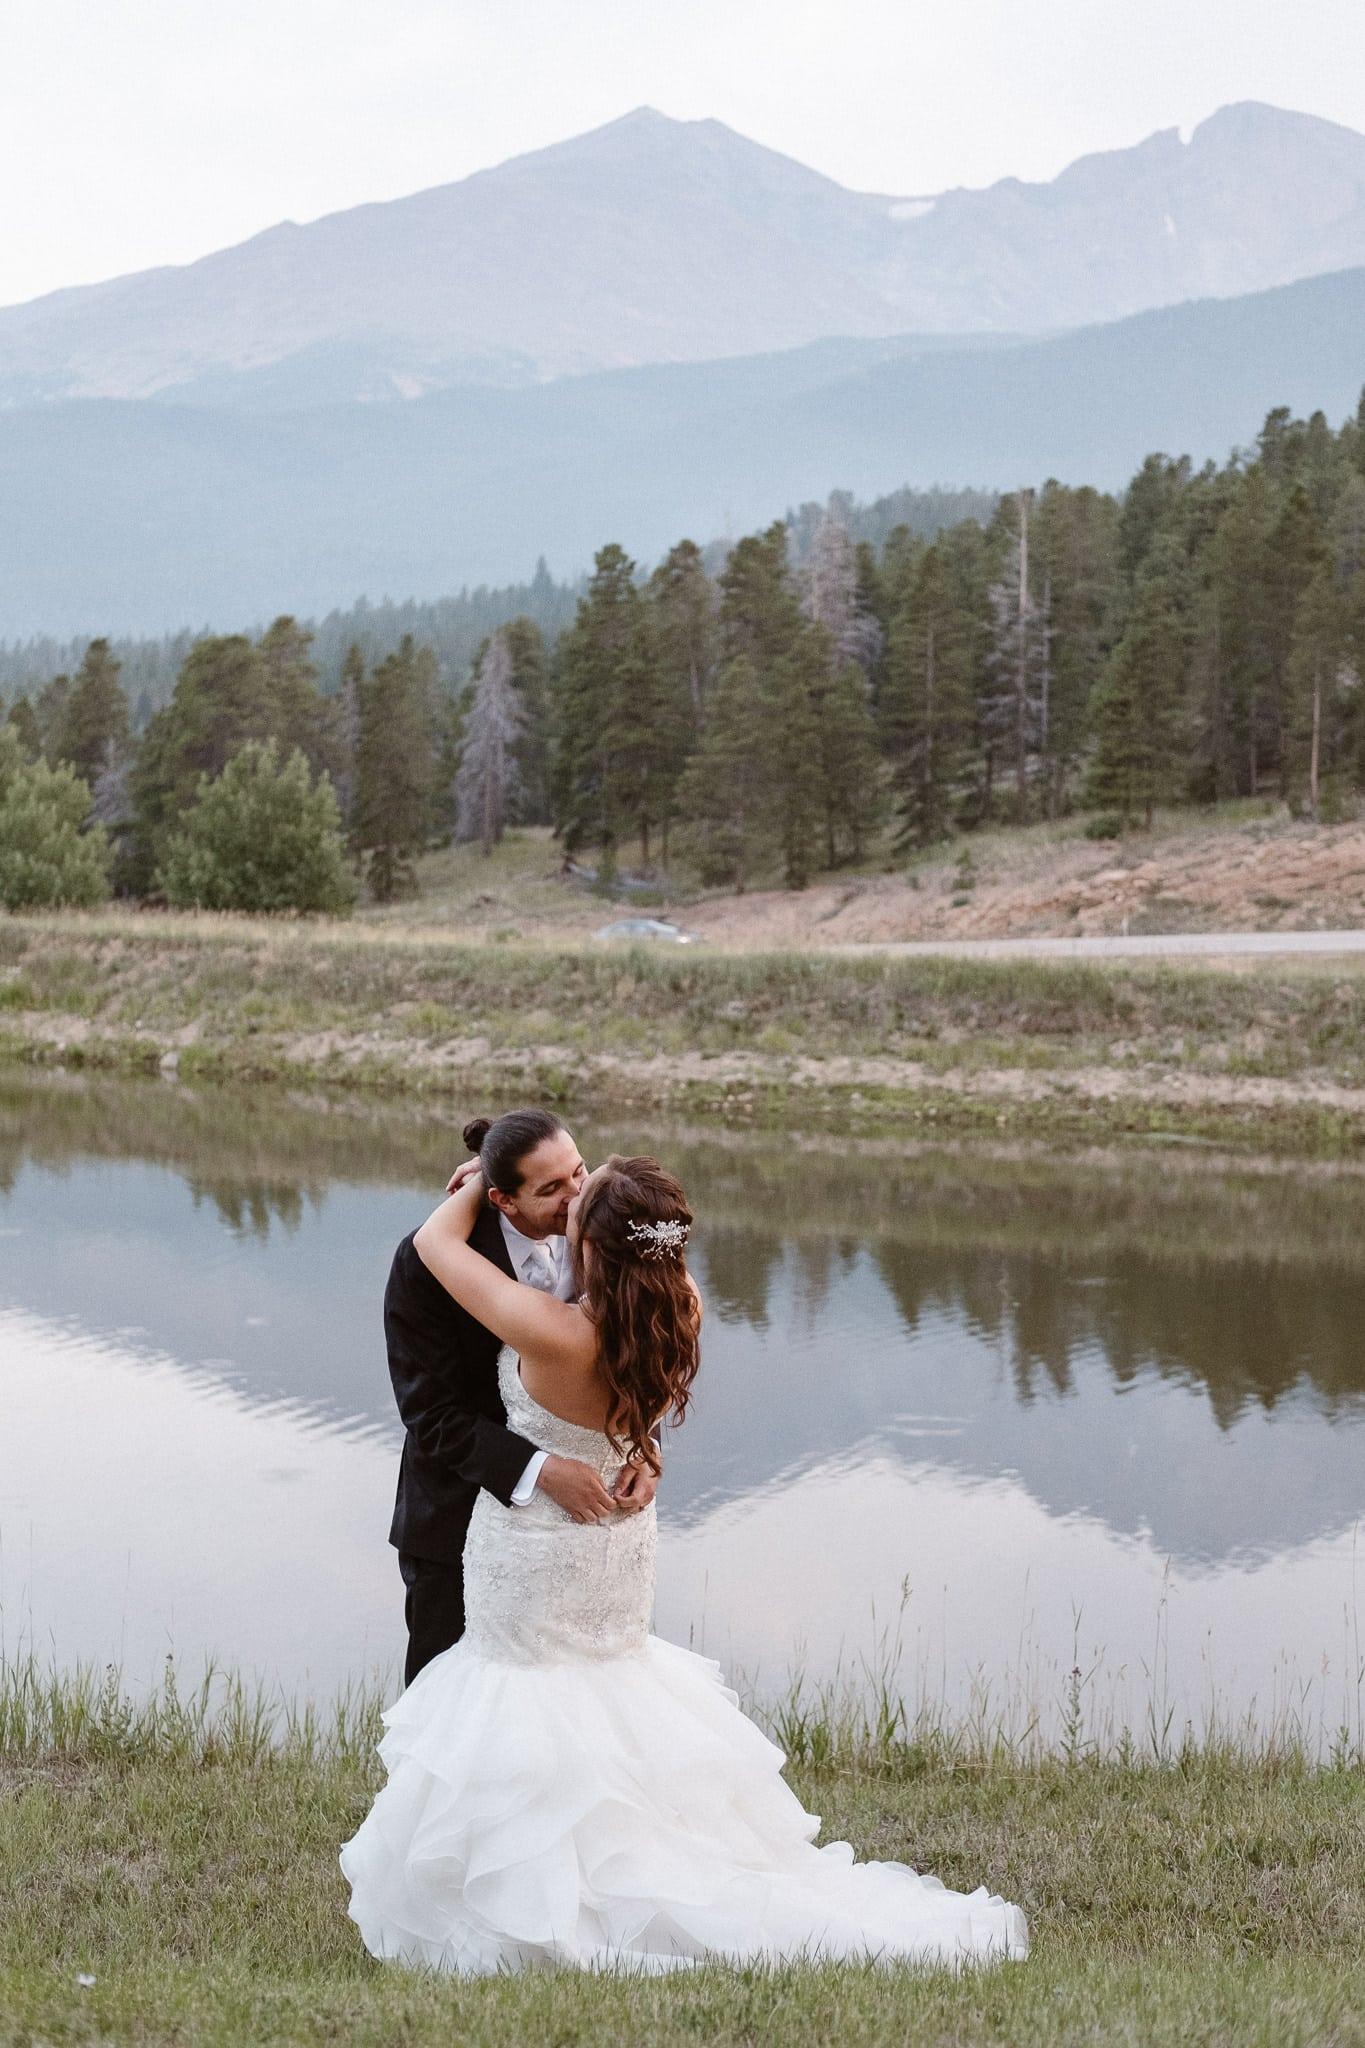 Dao House wedding photographer, Estes Park wedding venue, Colorado mountain wedding, bride and groom walking by pond,